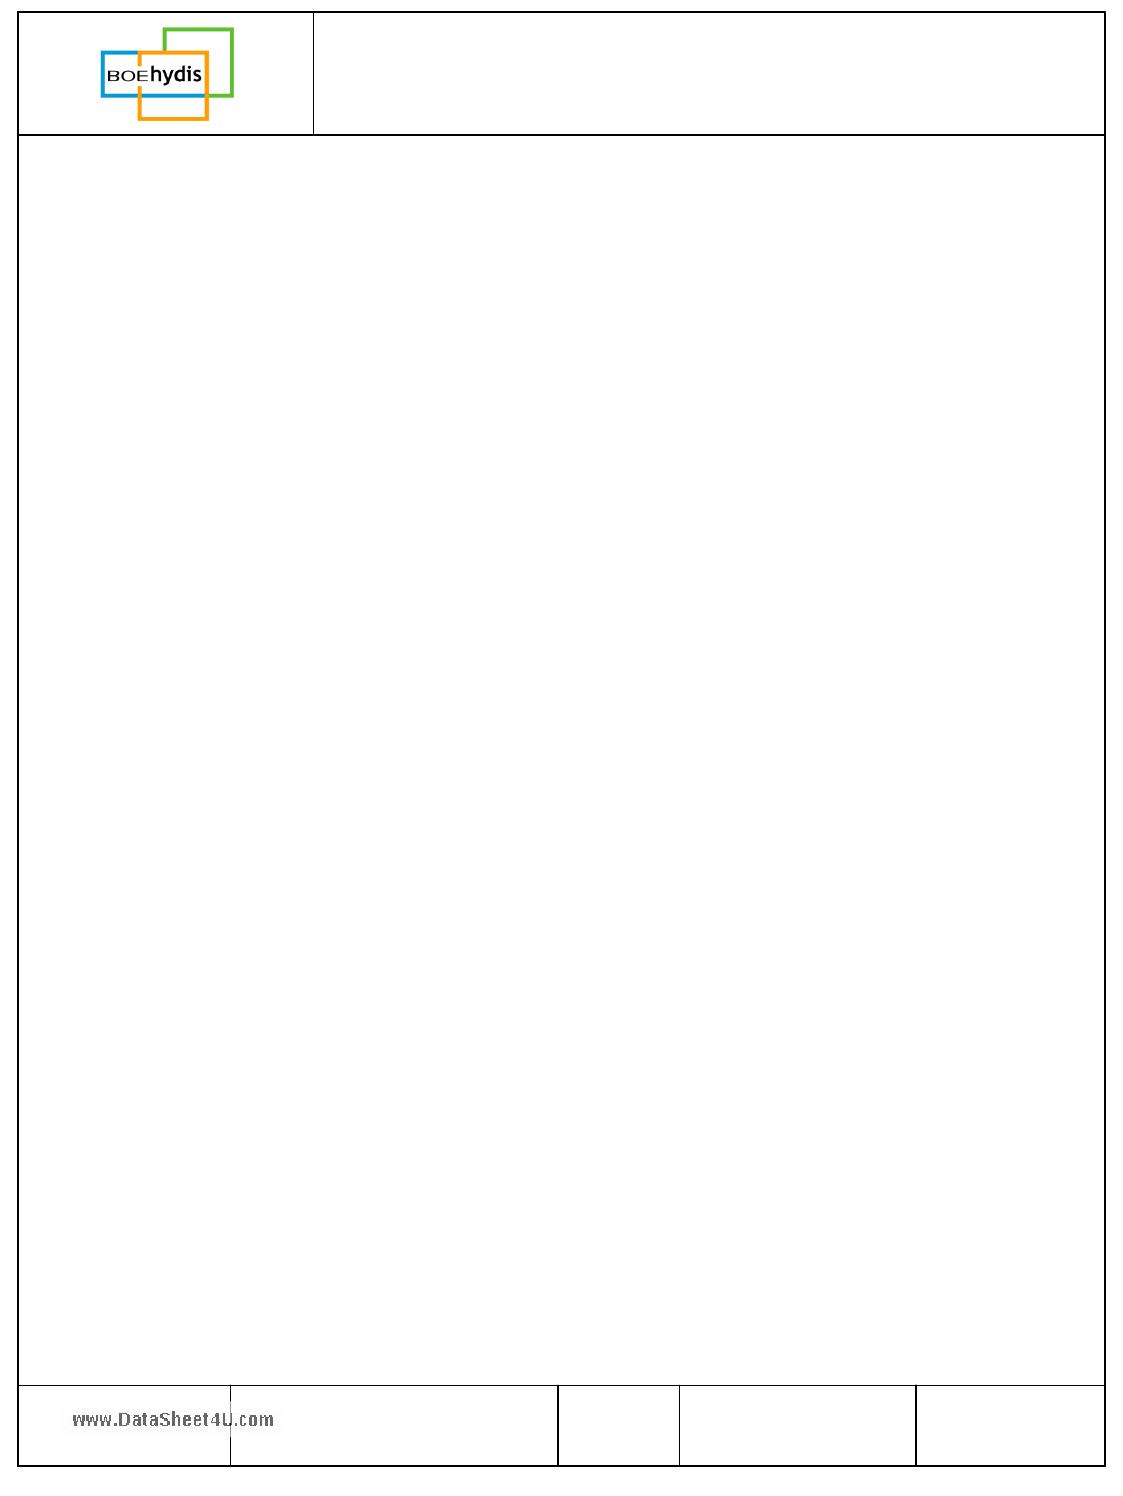 HV056WX1-100 Datasheet, HV056WX1-100 PDF,ピン配置, 機能